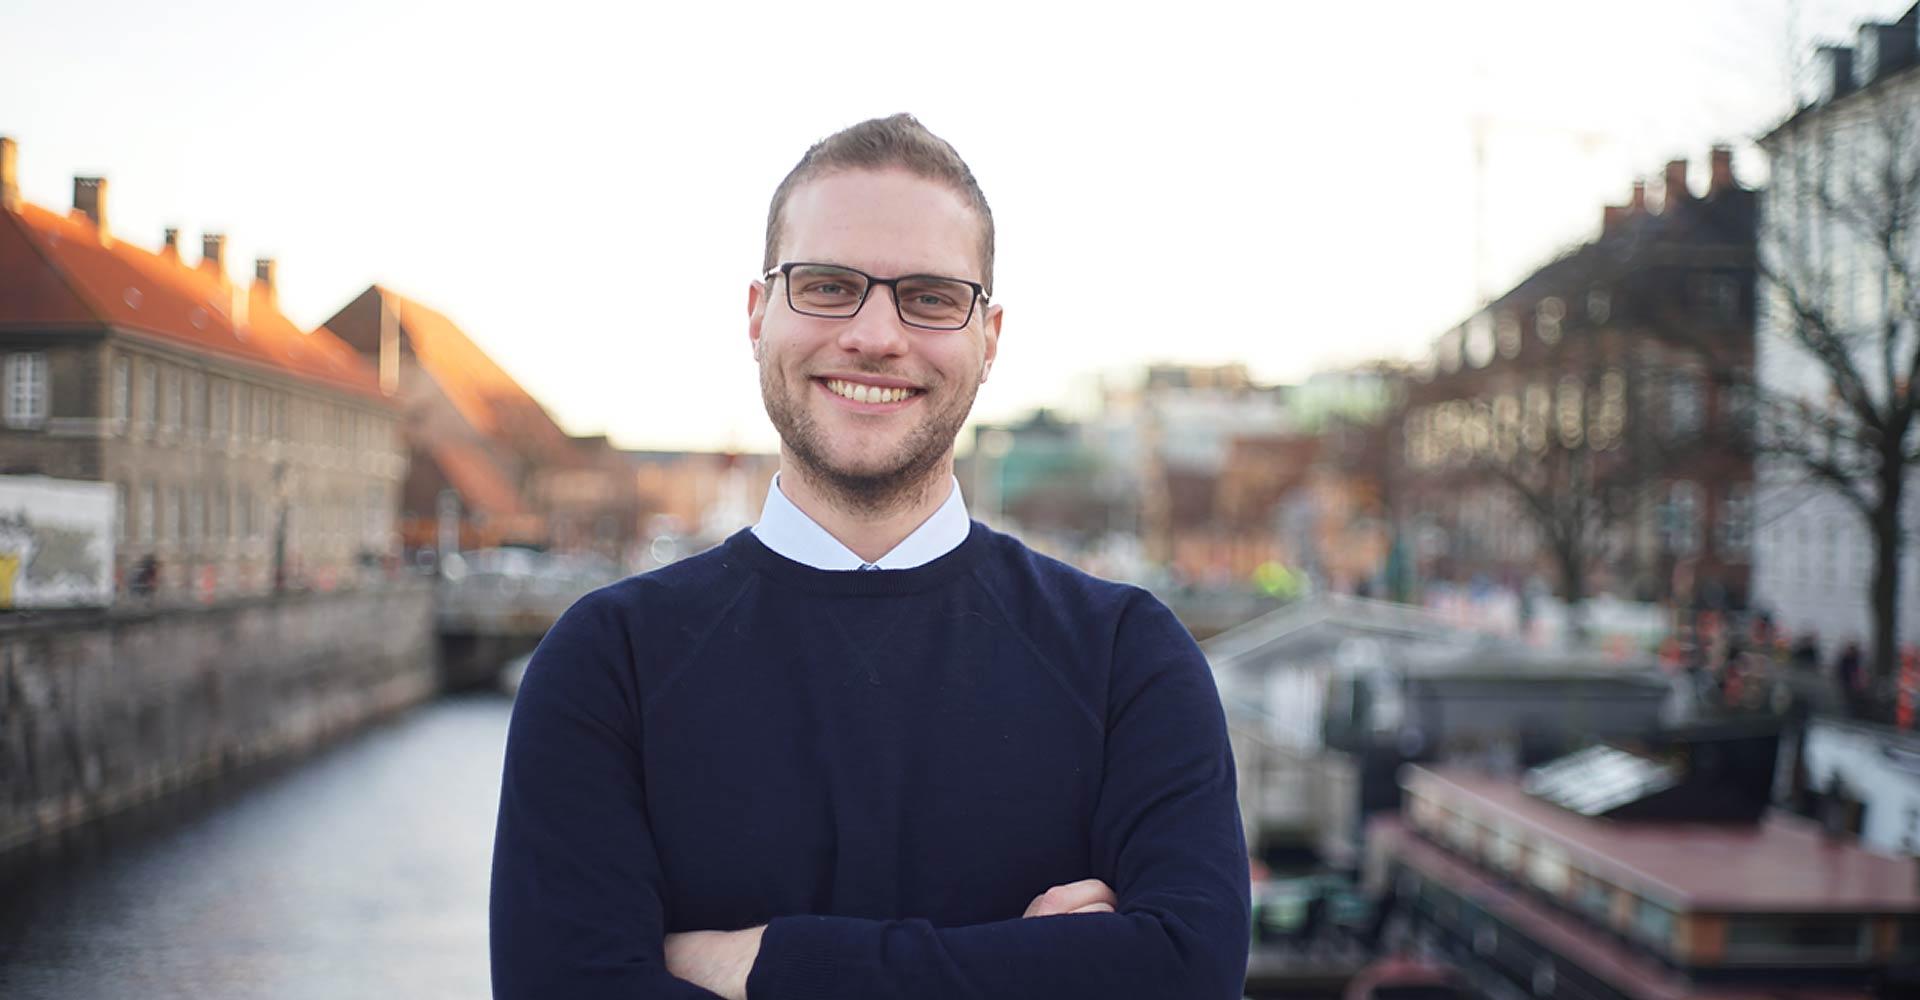 Bag Intelligo Denmark står Julian F. Christmas, Julian har erfaring siden 2008 med konverteringsoptimering og opbygning af tillid til nye brands